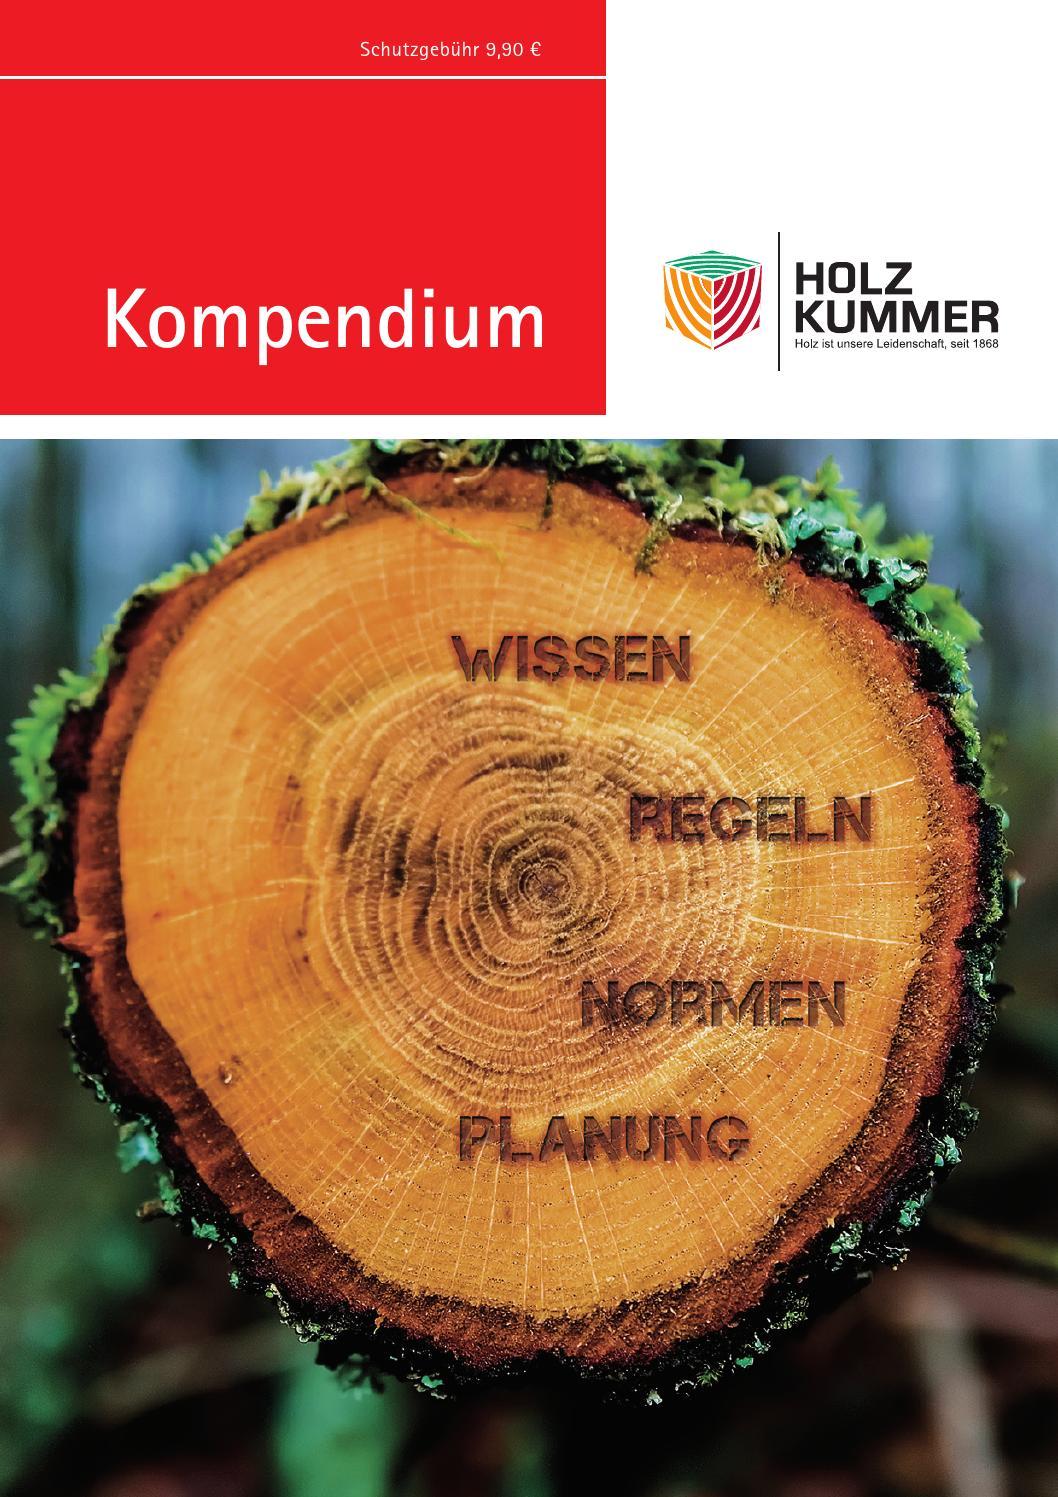 Kompendium Holz Kummer 2016 by Kaiser Design - issuu